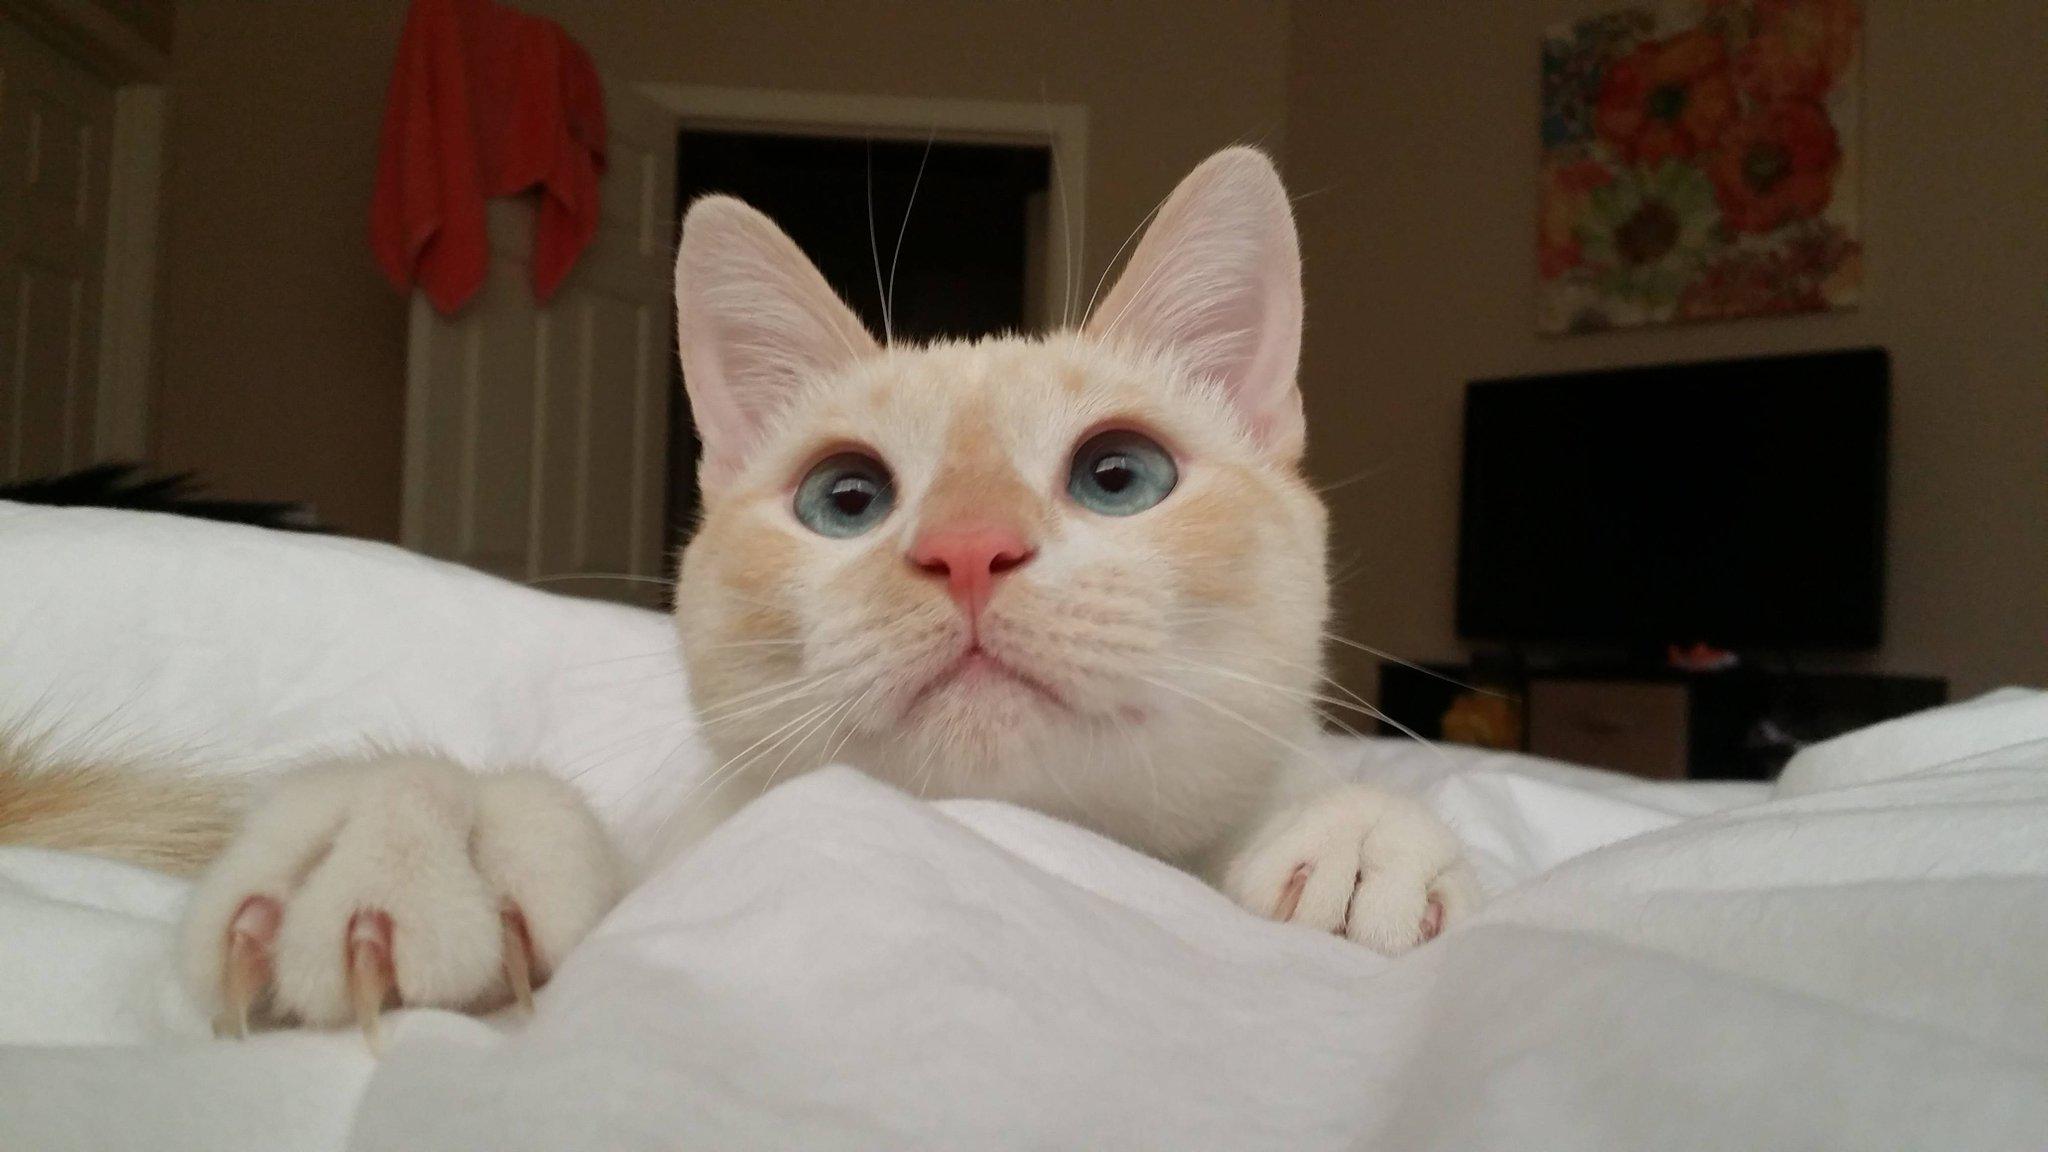 """Wake up, mom!"" http://t.co/yAWplrqpQ9"